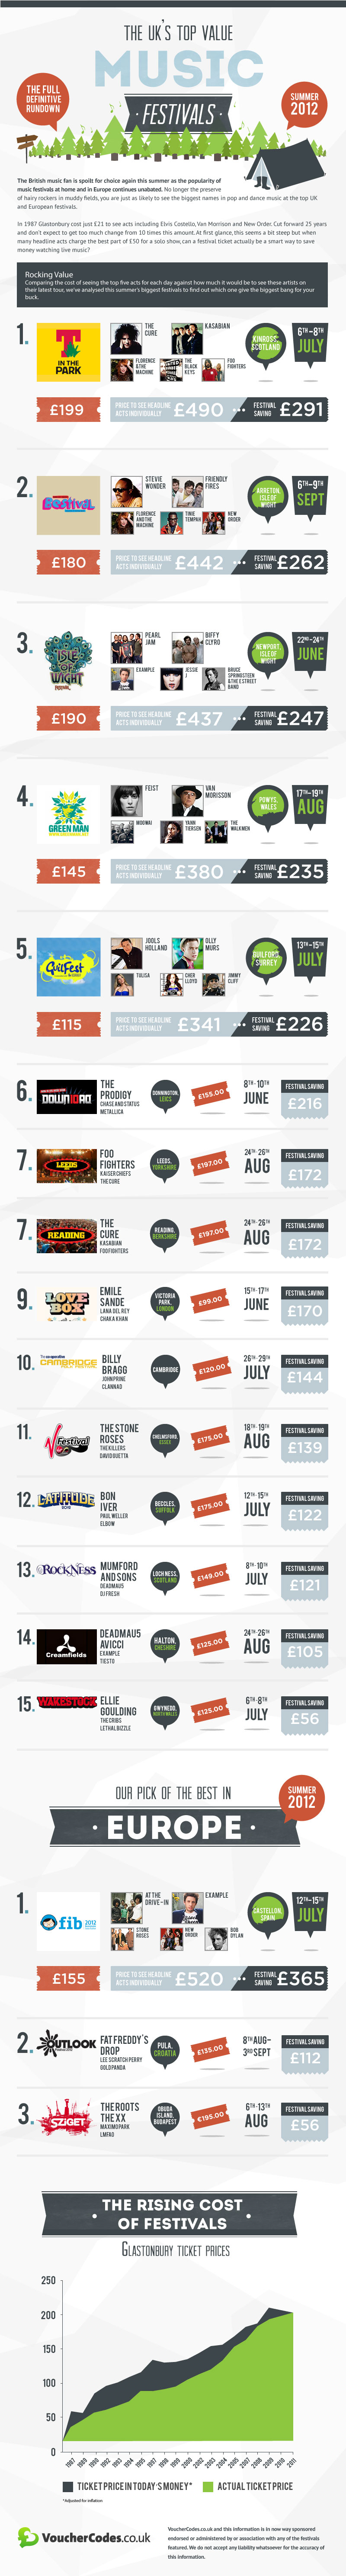 Music Festival 2012 Infographic